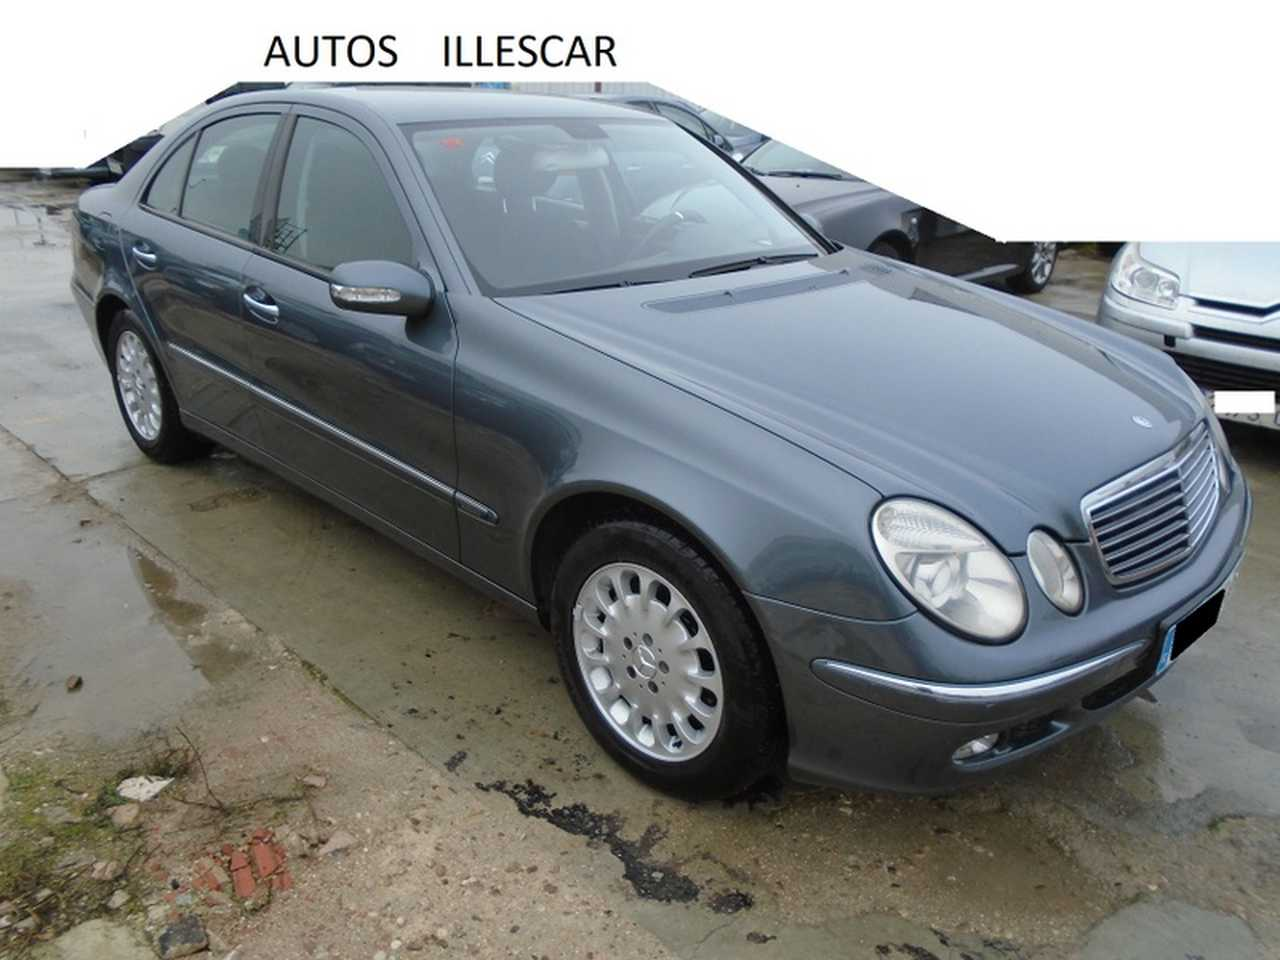 Mercedes Clase E 320 CDI ADMITIMOS PRUEBA MECANICA  - Foto 1